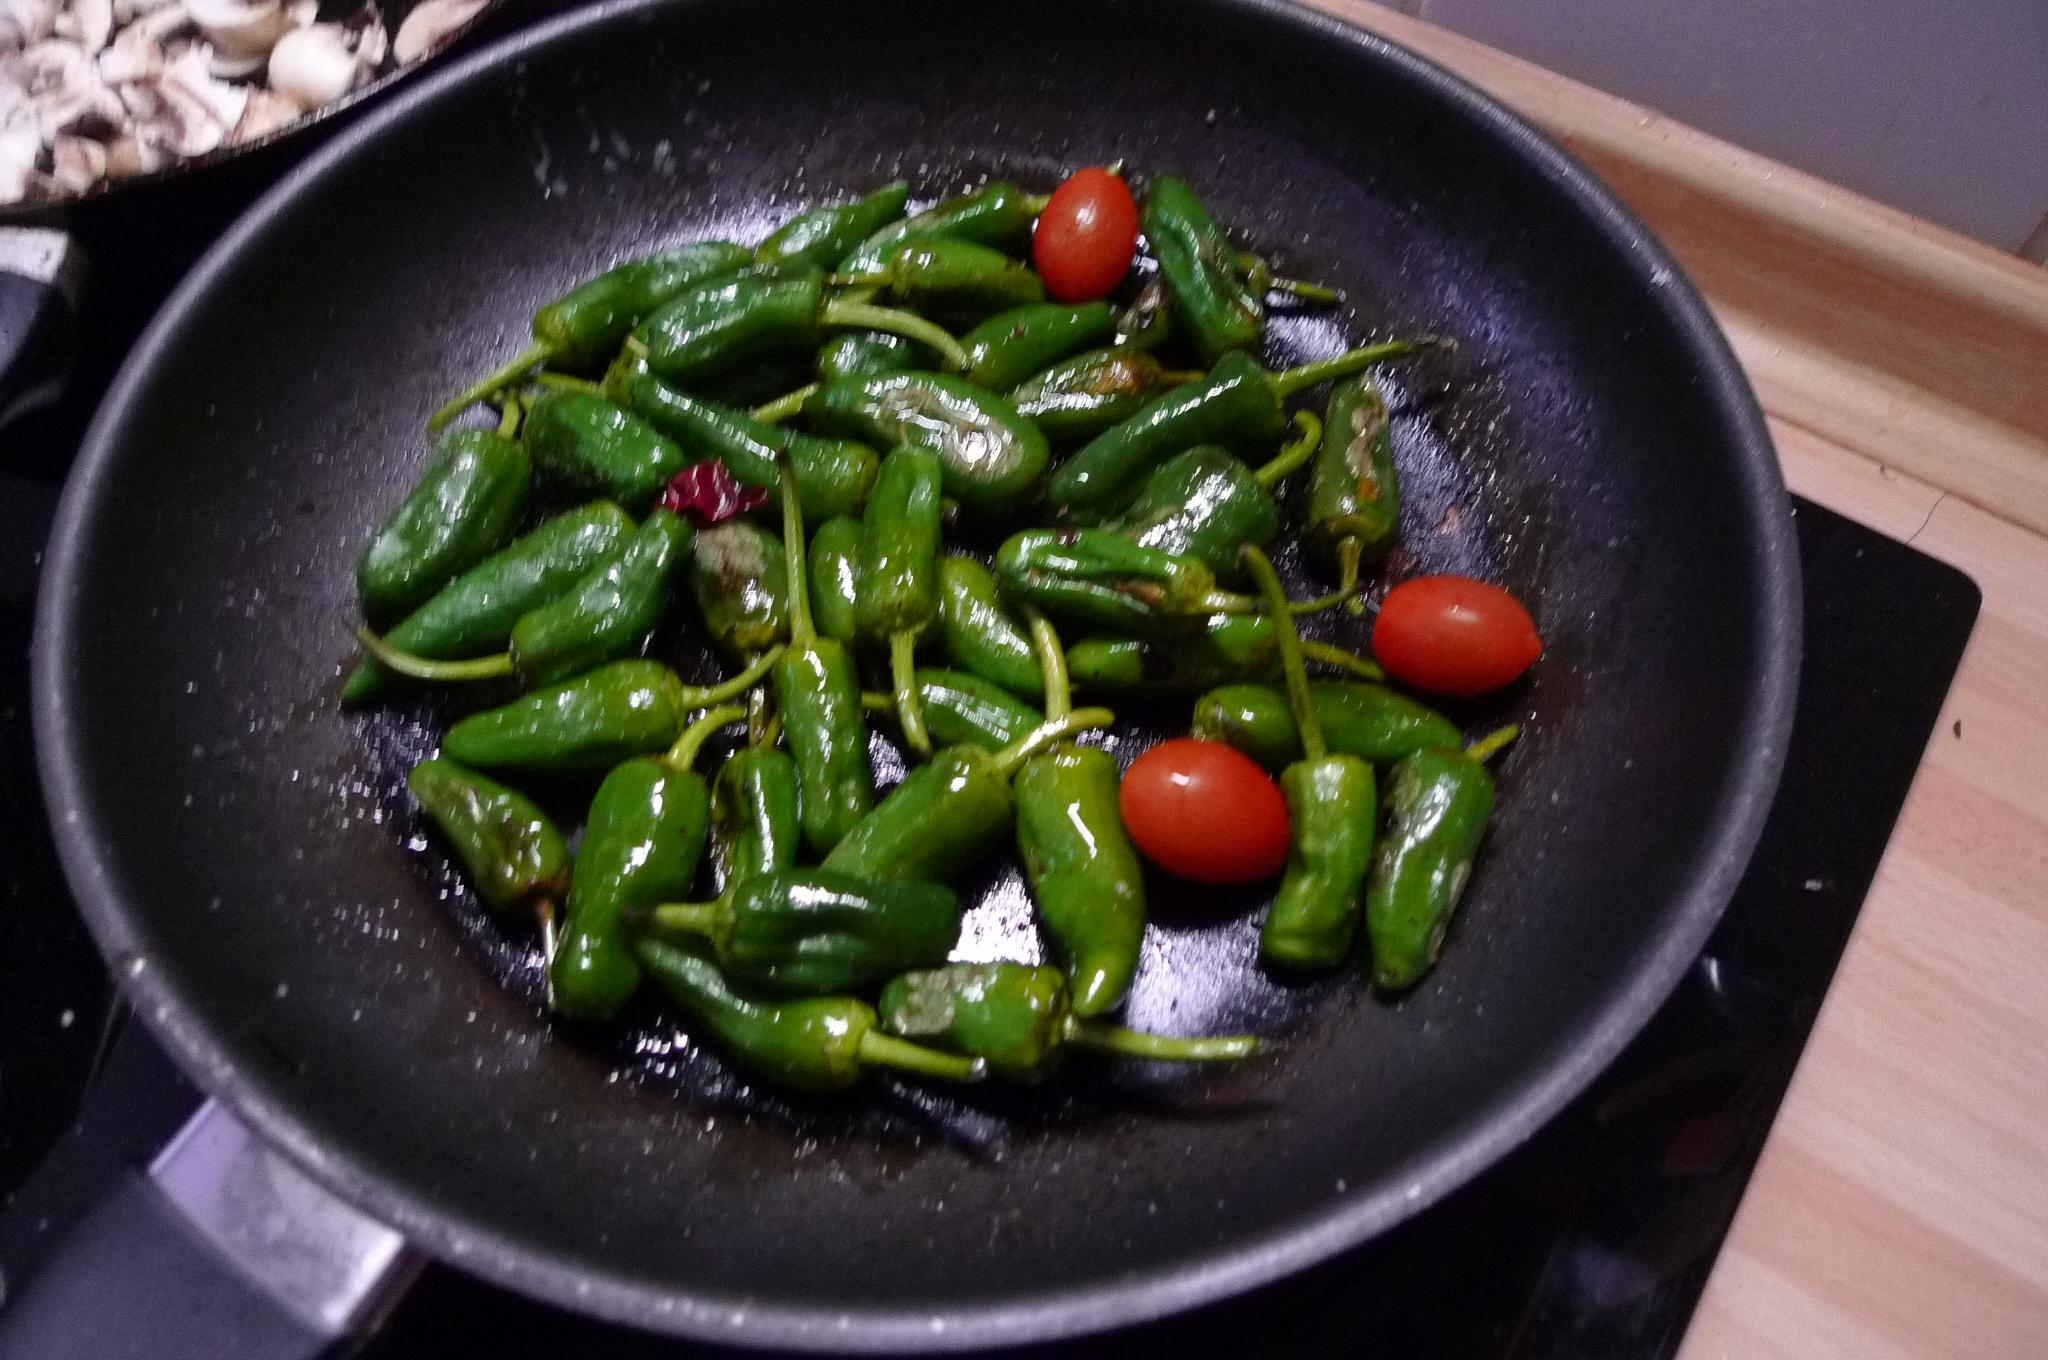 Grüne Nudeln,Ruccolapesto,Pilze,Bratpaprika,Salat-8.3.15   (4)